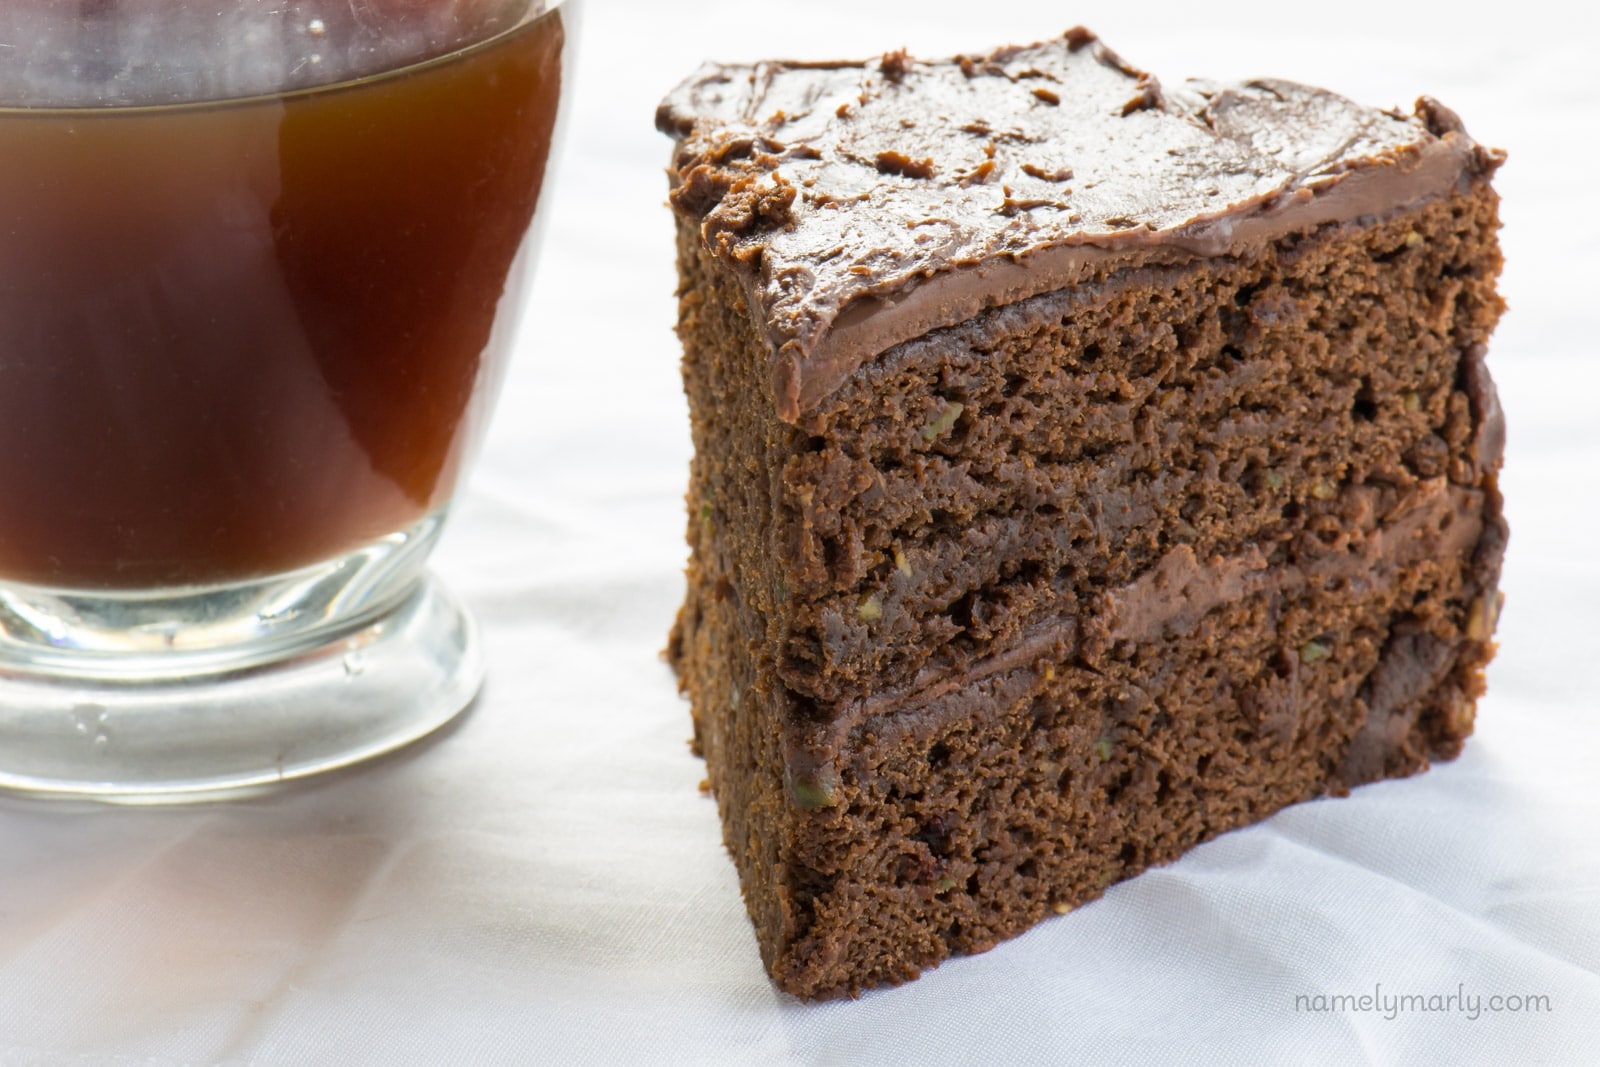 Vegan Chocolate Avocado Cake with Chocolate Frosting ...